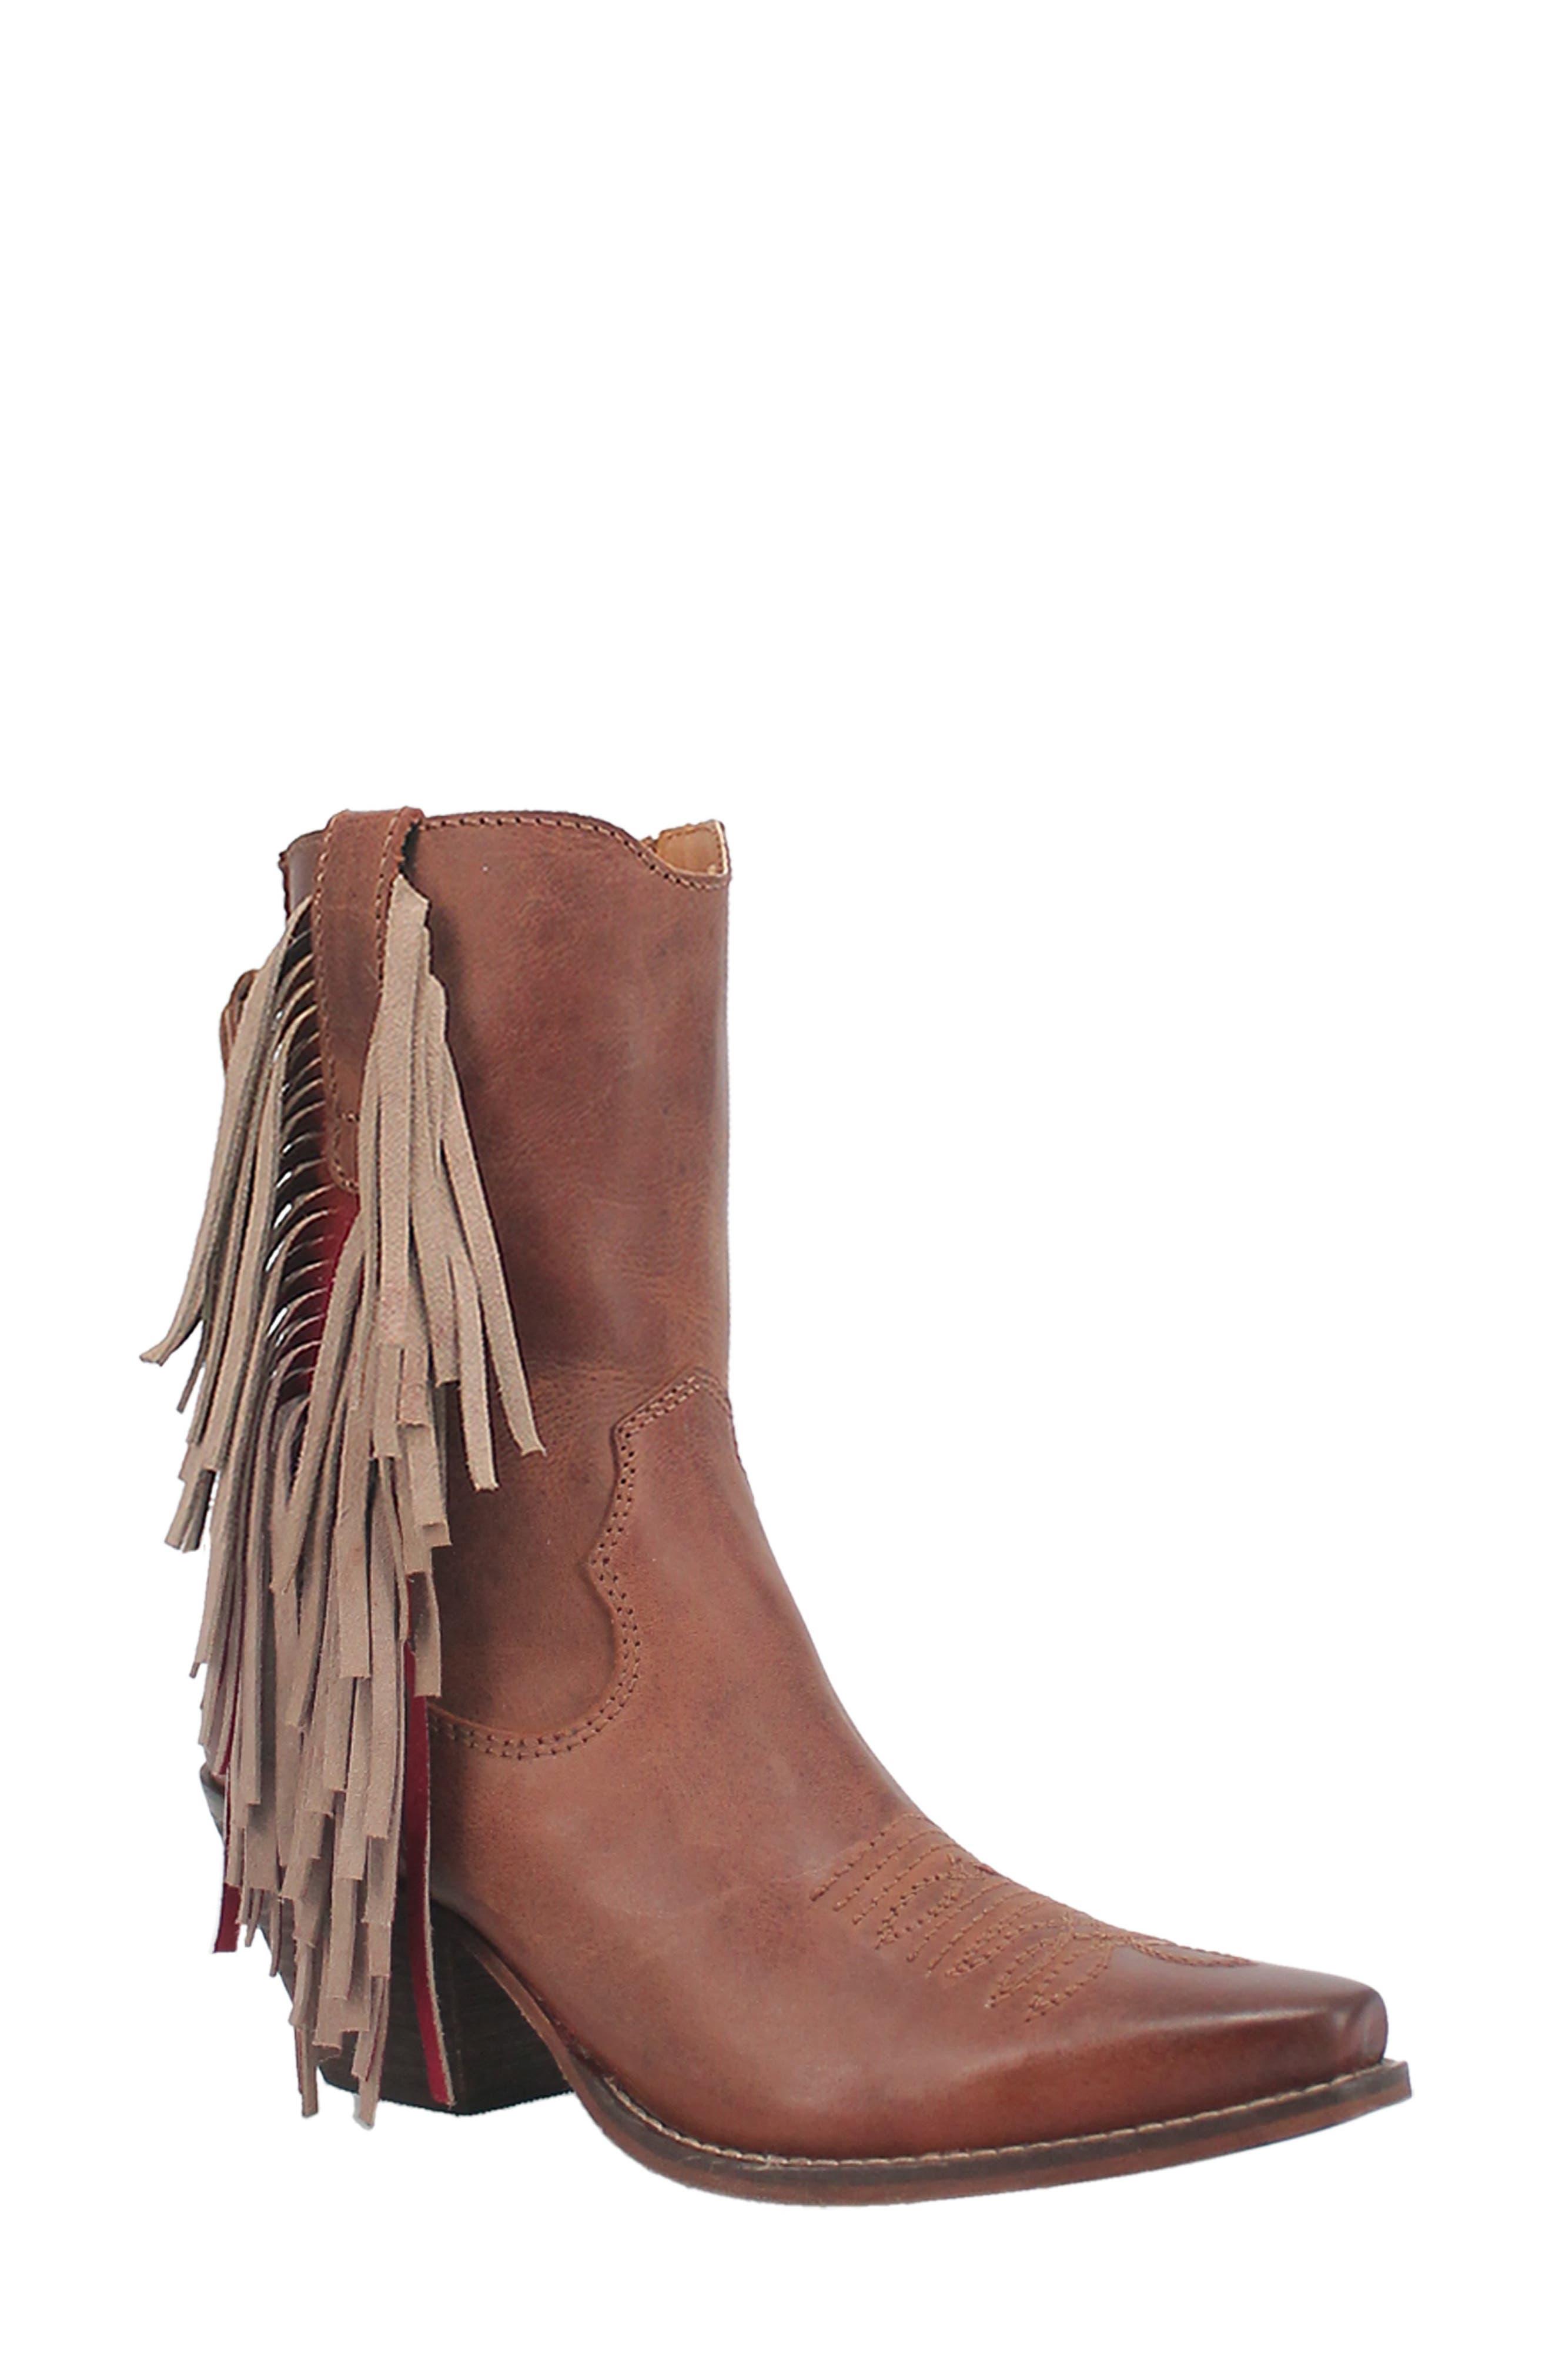 Fringe Benefits Western Boot